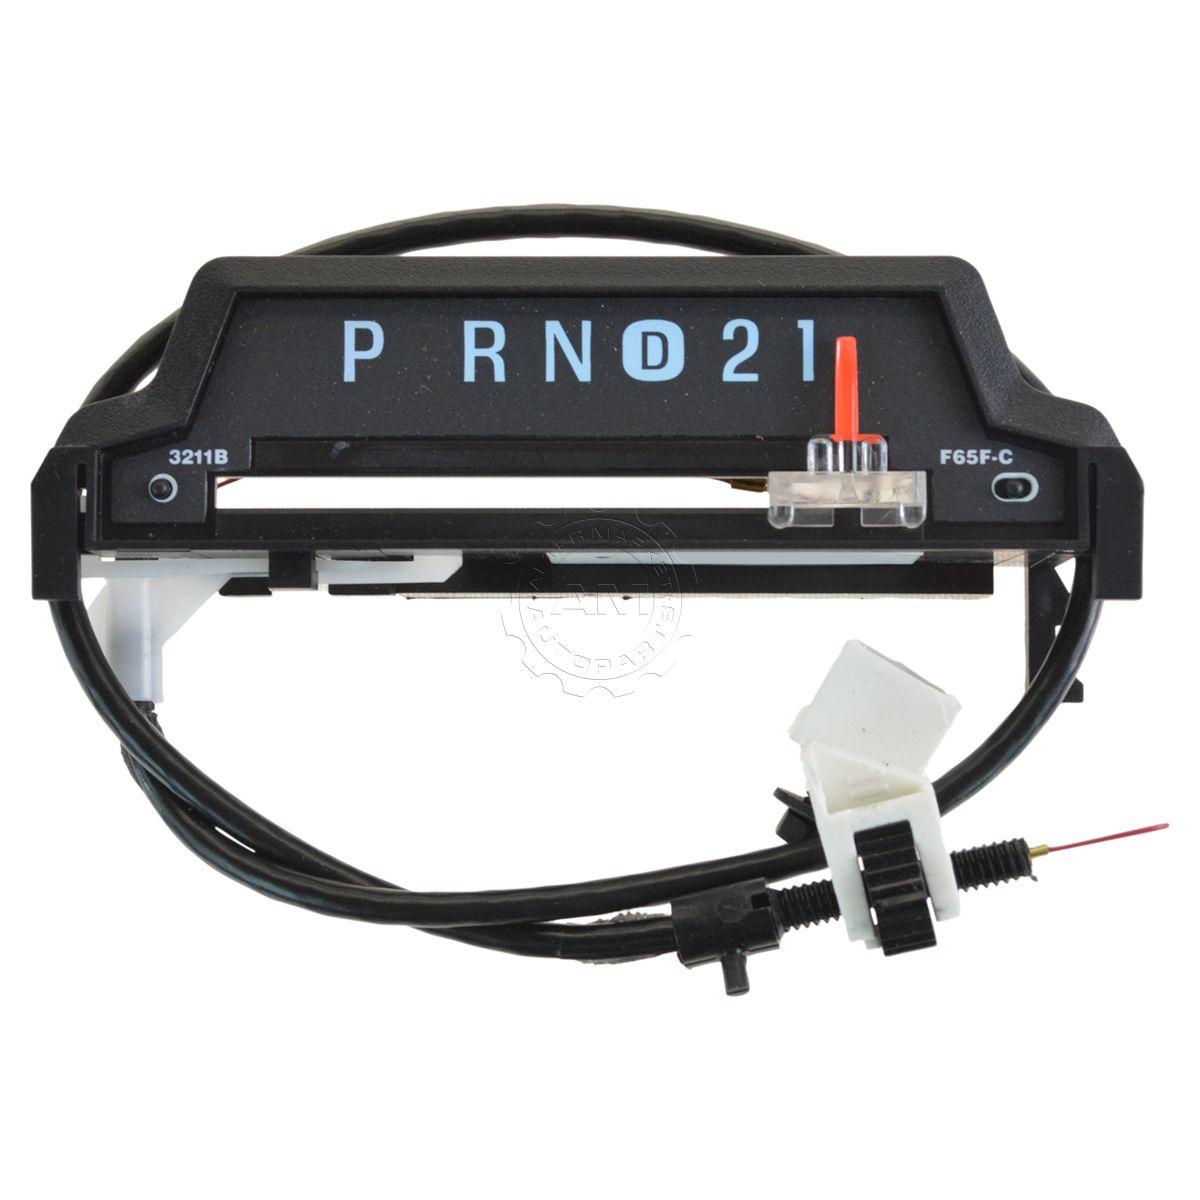 Details about OEM Transmission Position Shift Indicator PRND21 & Cable for  Ford Pickup Truck